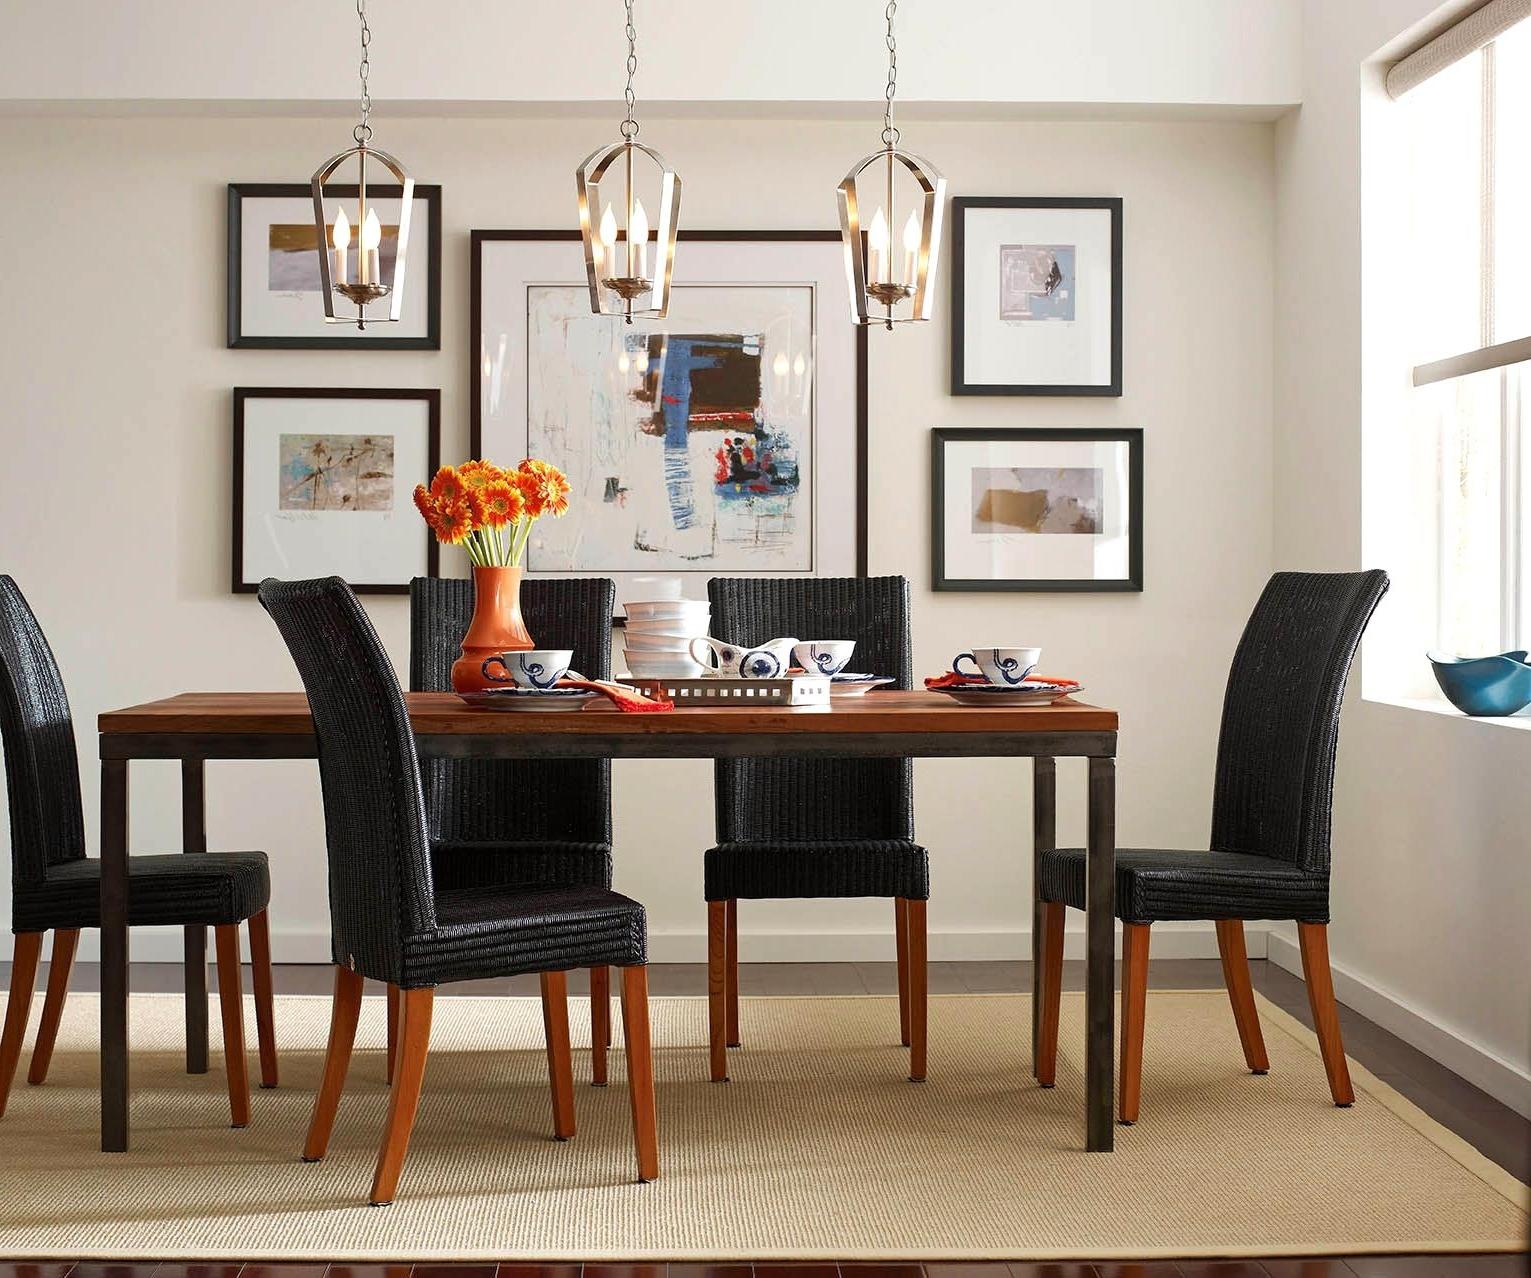 Popular Enjoyable Pendant Lights Dining Room Hanging Delier Dining Room Regarding Over Dining Tables Lights (View 16 of 25)